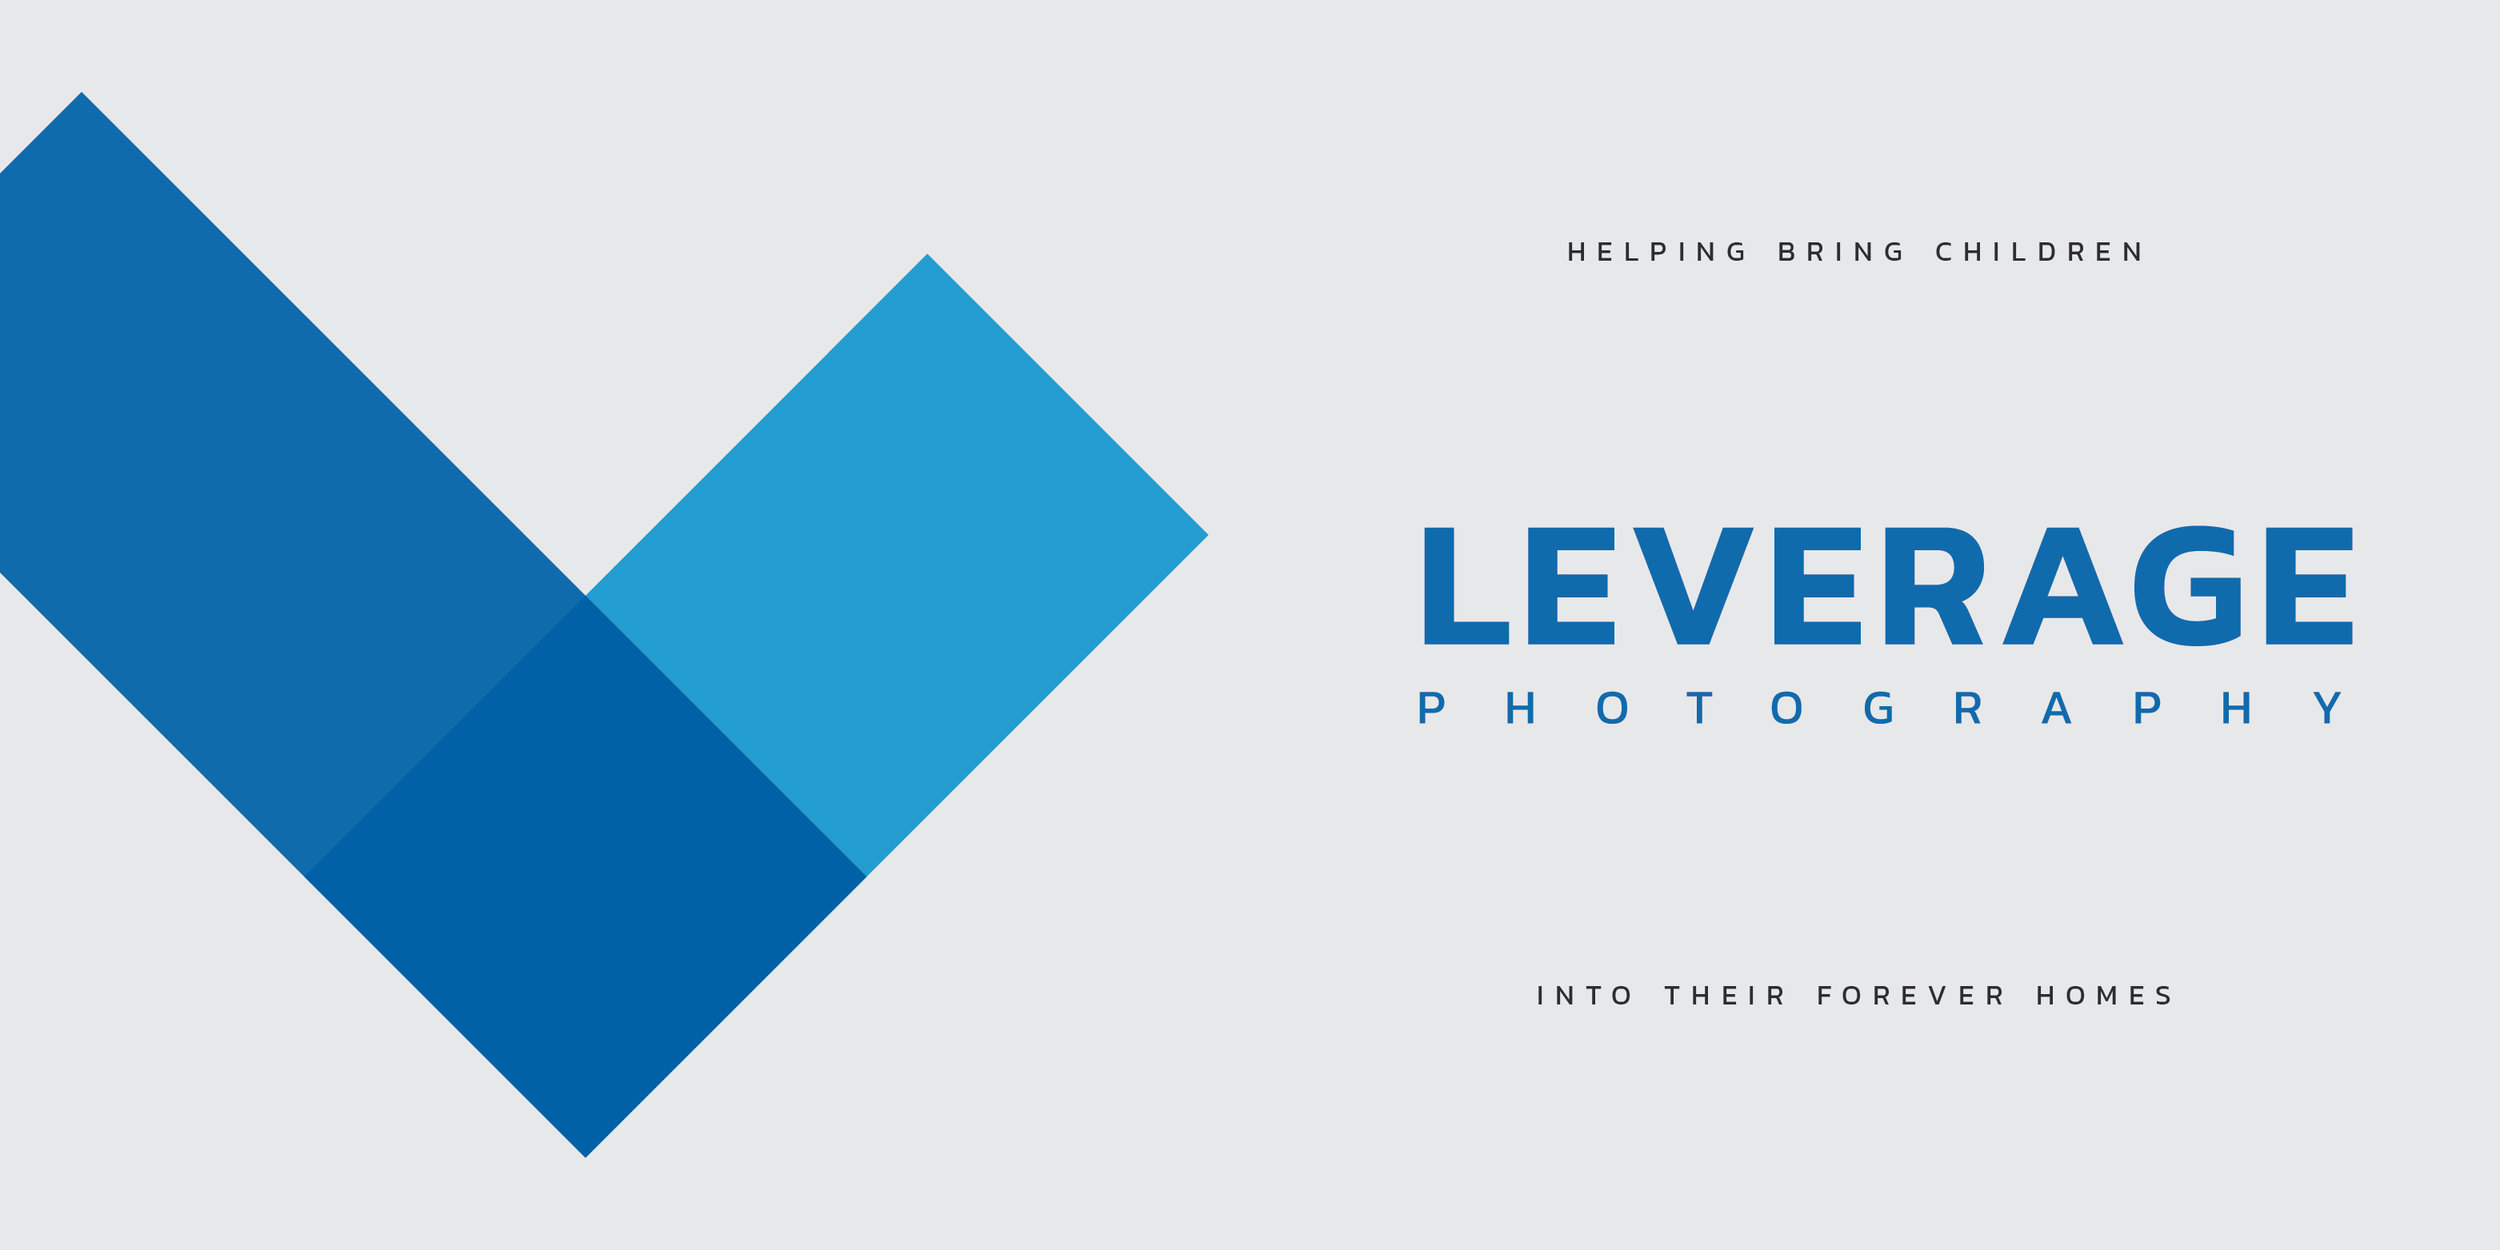 Leverage-Case-Study-Images-01.jpg